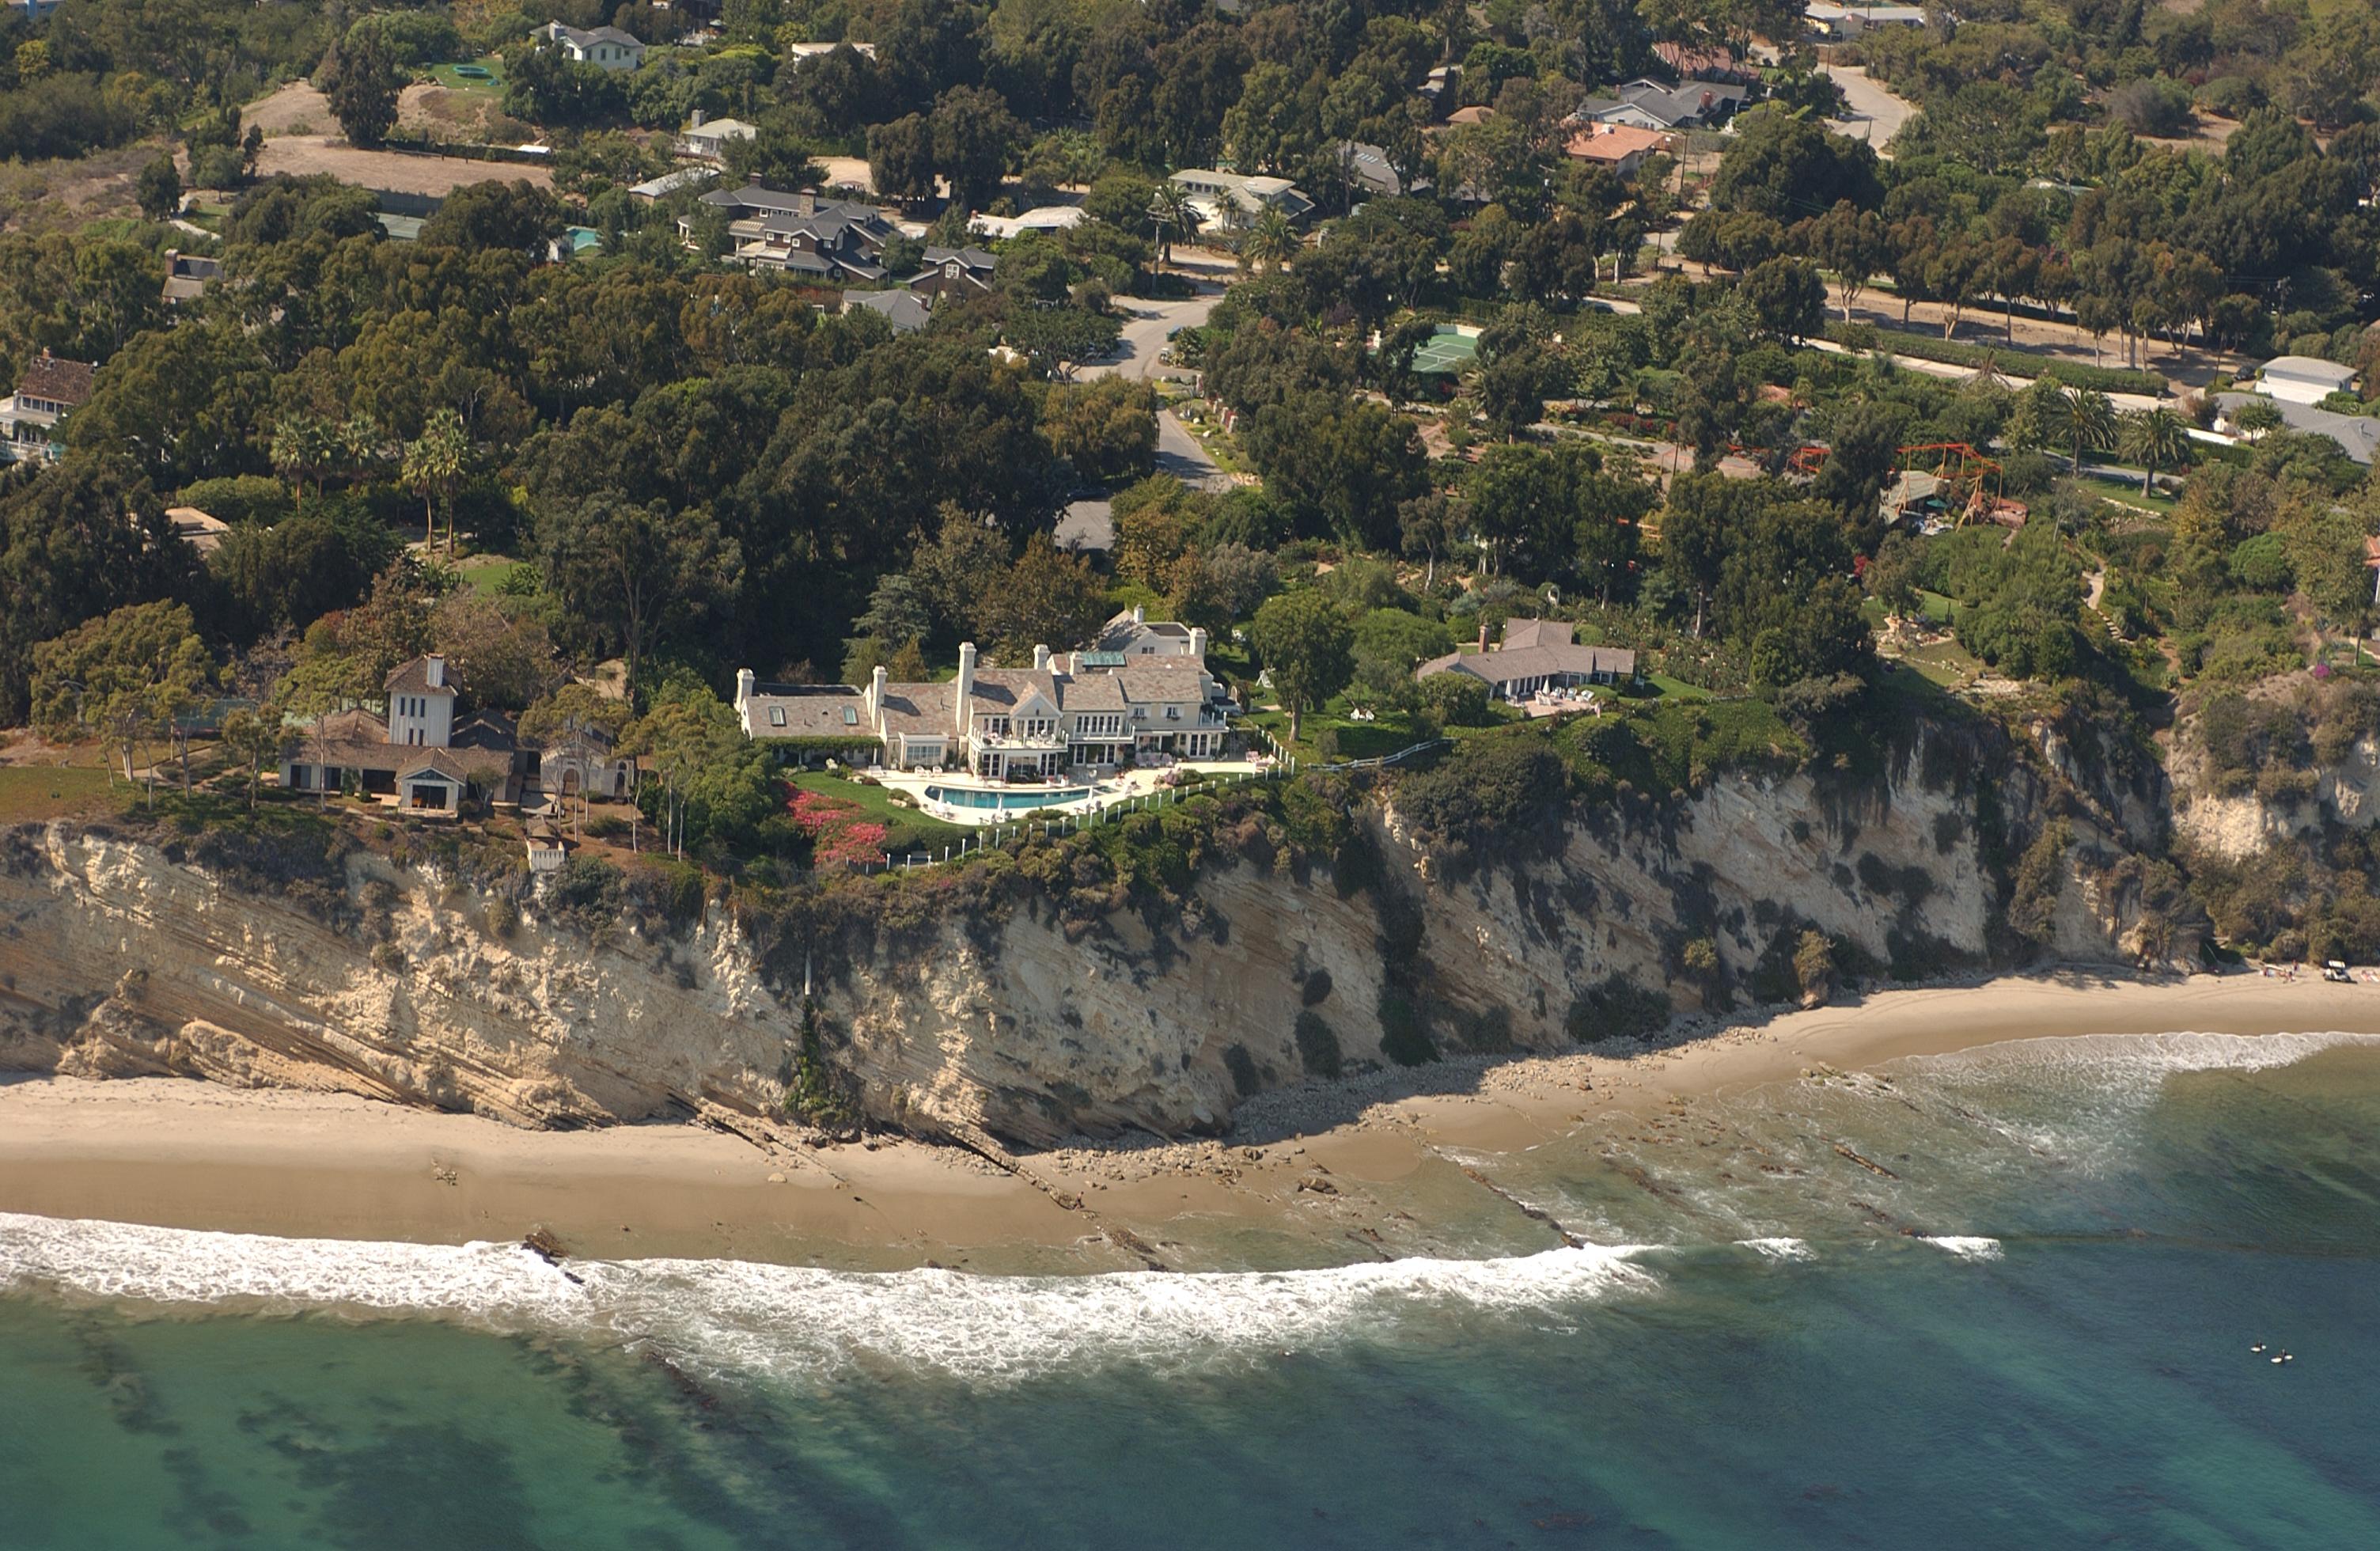 http://upload.wikimedia.org/wikipedia/commons/f/f6/Streisand_Estate.jpg